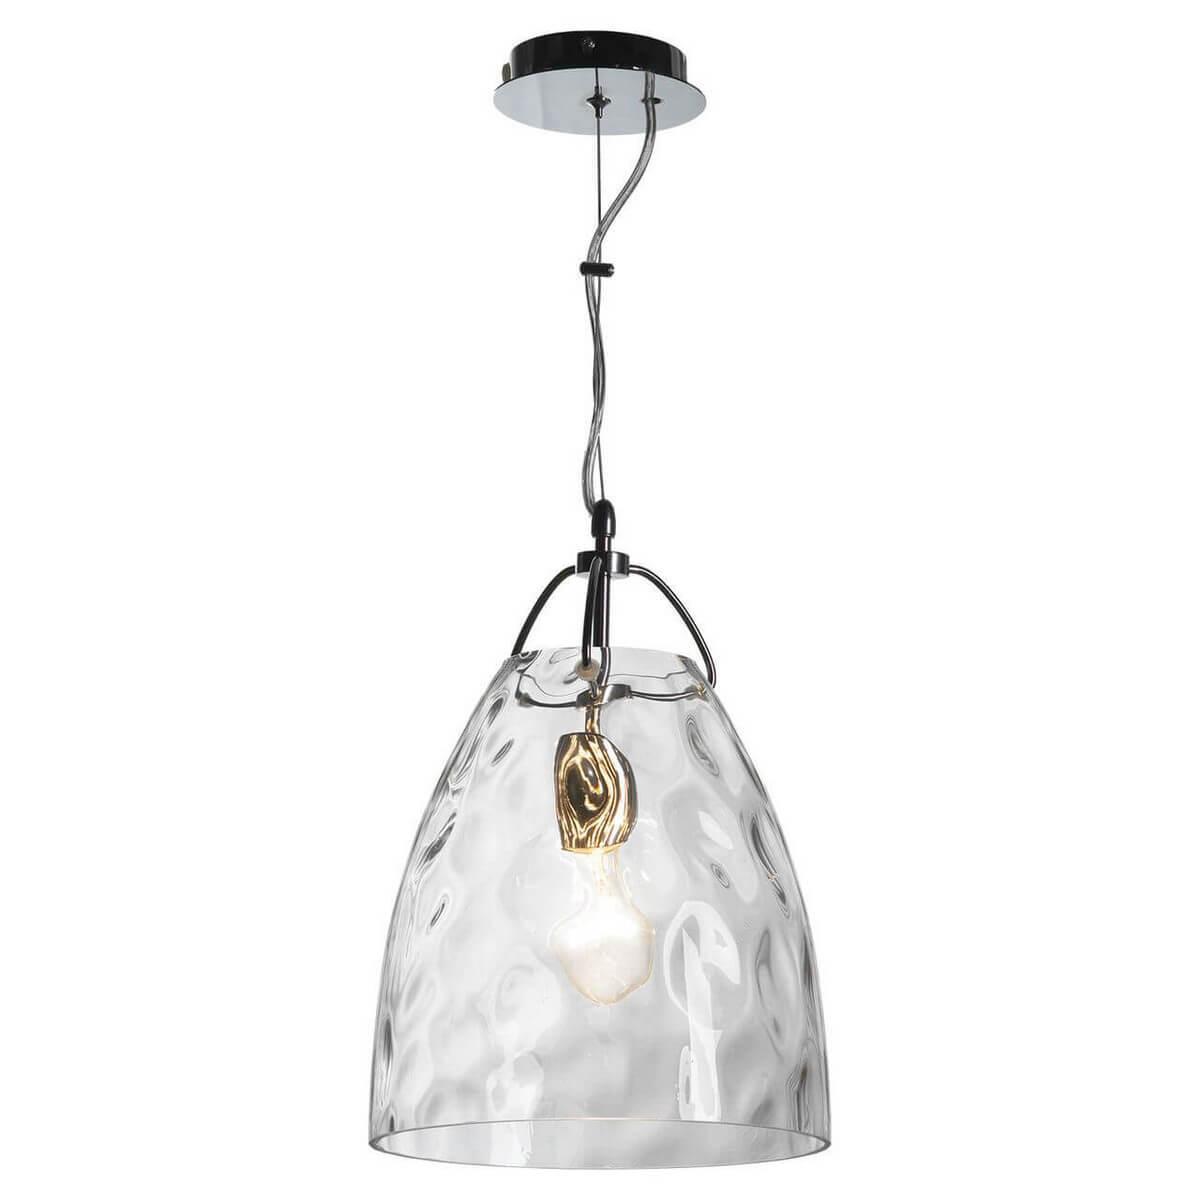 Подвесной светильник Lussole LOFT LSP-9629, E27, 60 Вт спот lussole loft lsp 9880 e27 60 вт